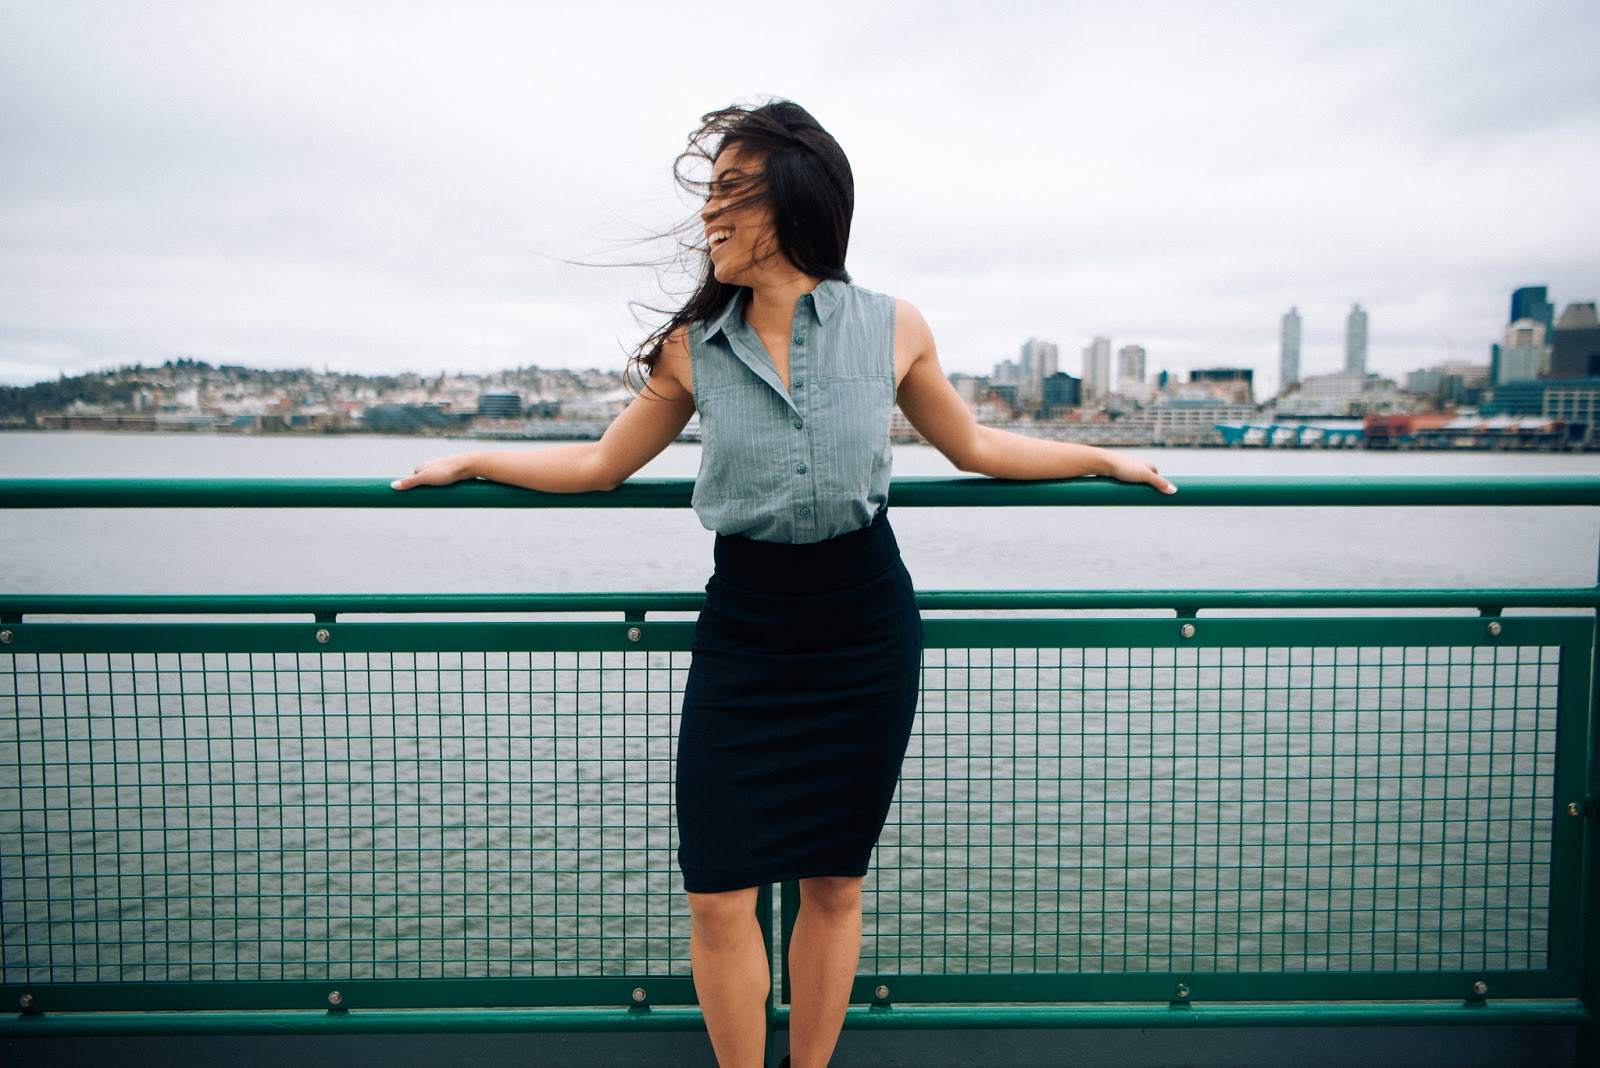 f41b894b791 How to Pose like a Fashion Blogger: 12 Ideas You Should Try - Emma's ...